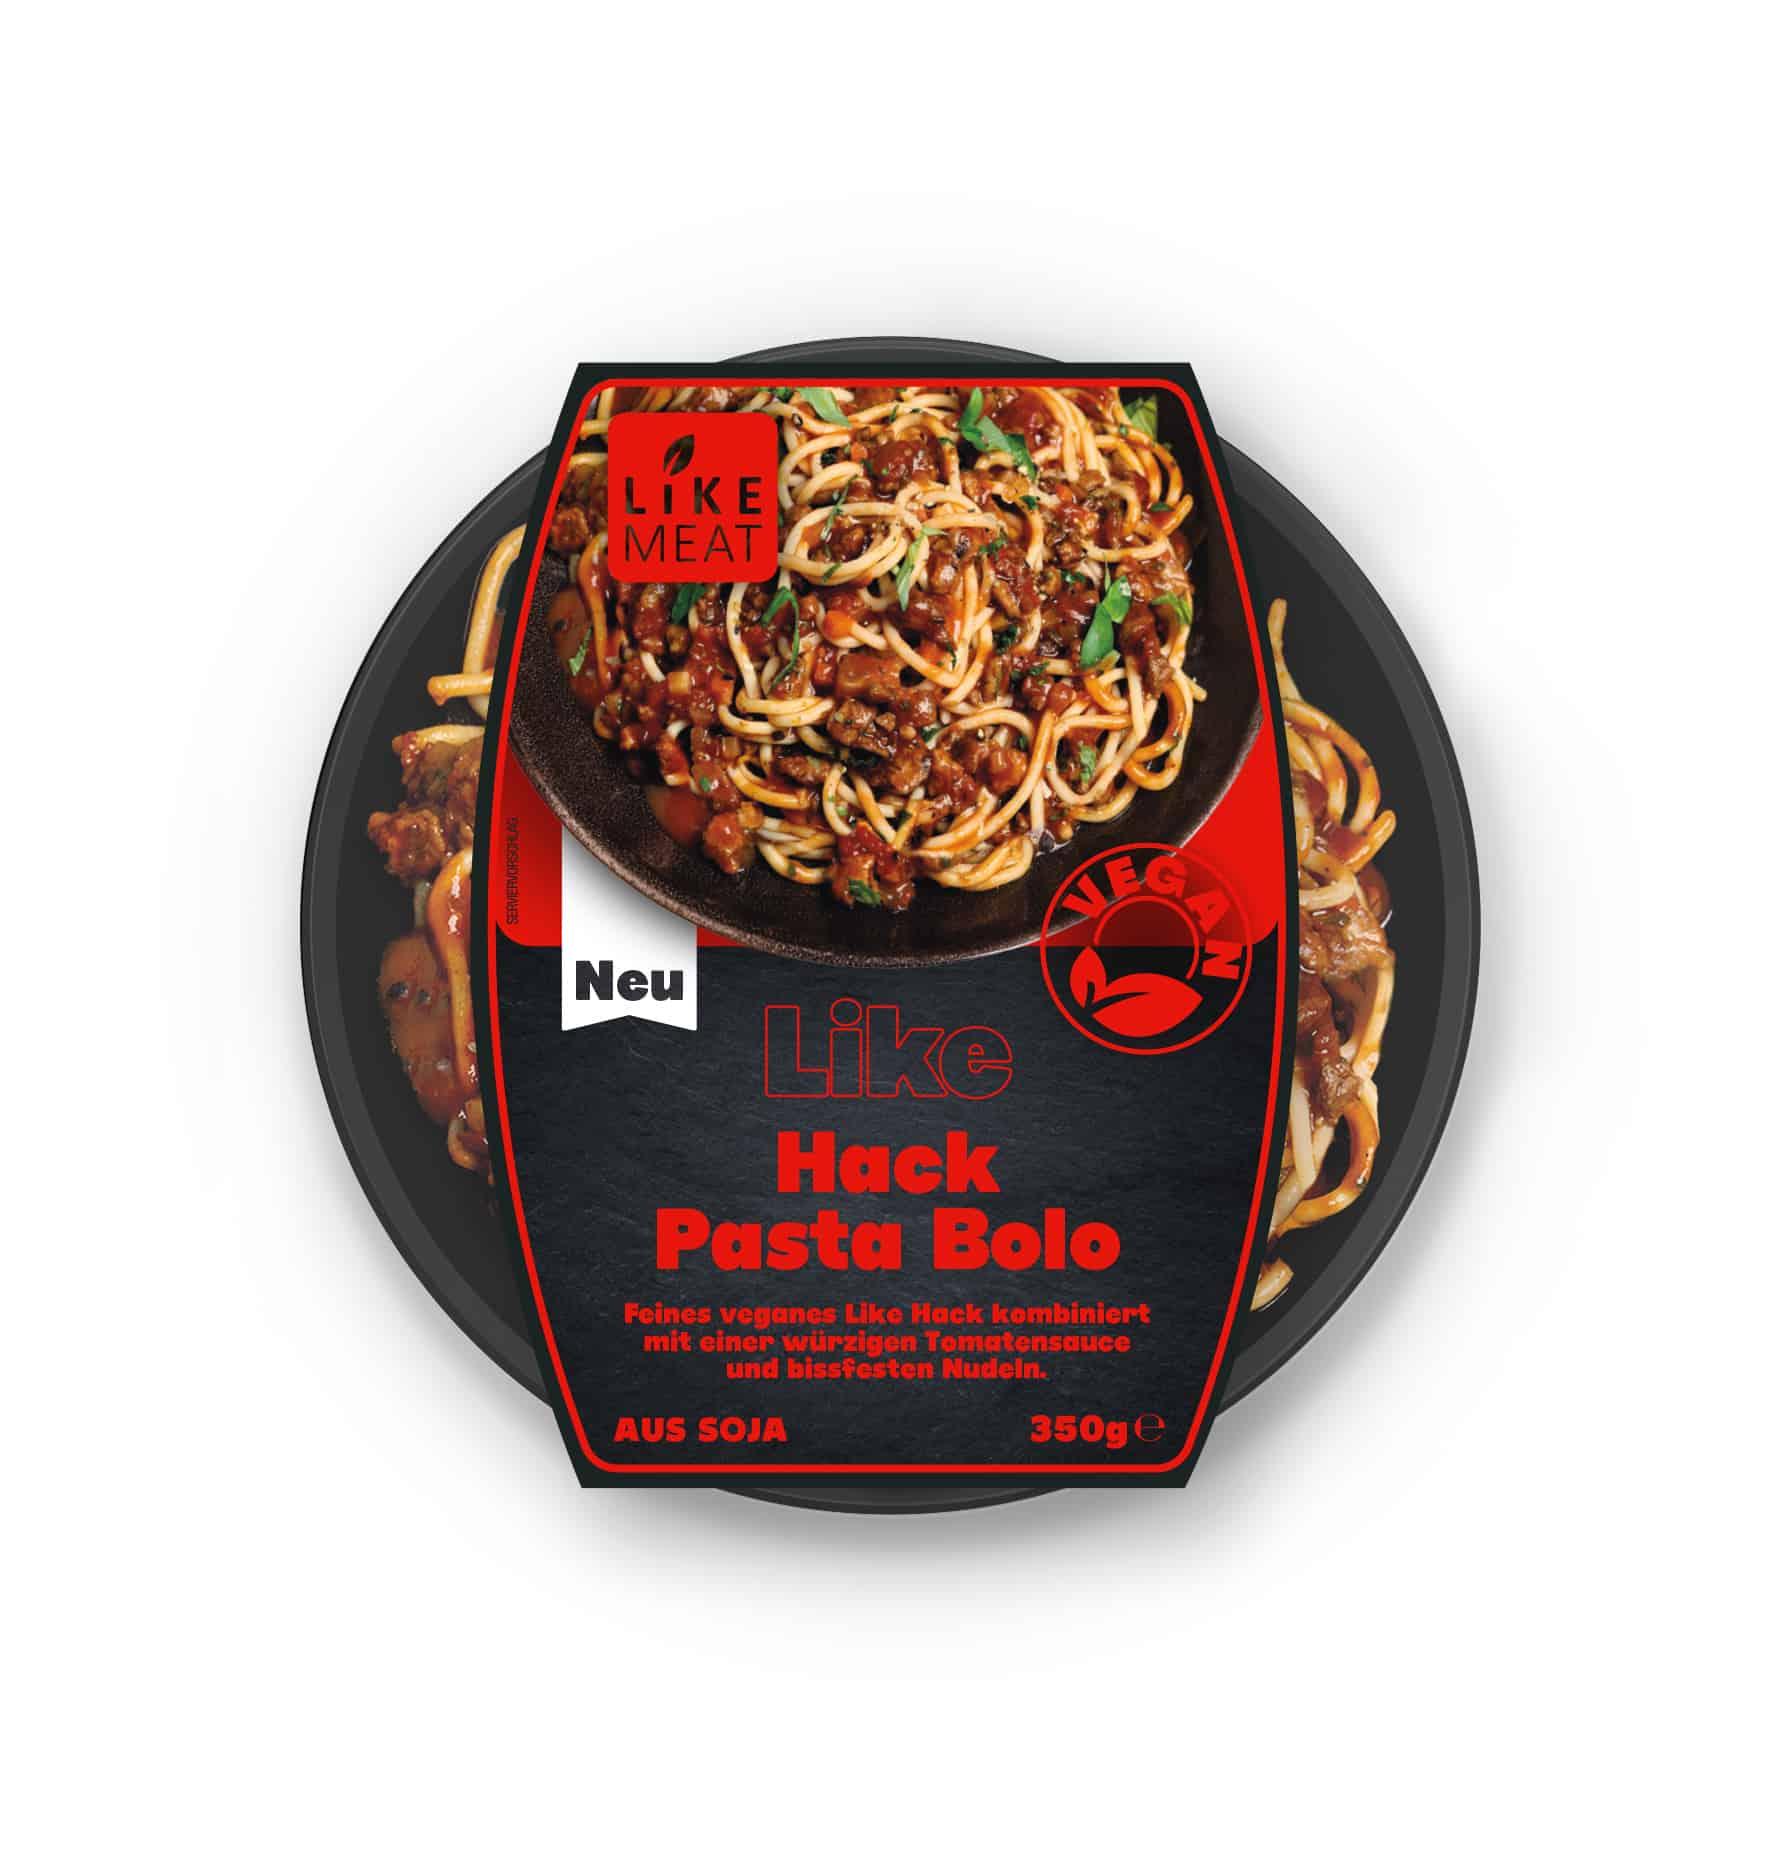 LikeMeat Like Hack Pasta Bolo